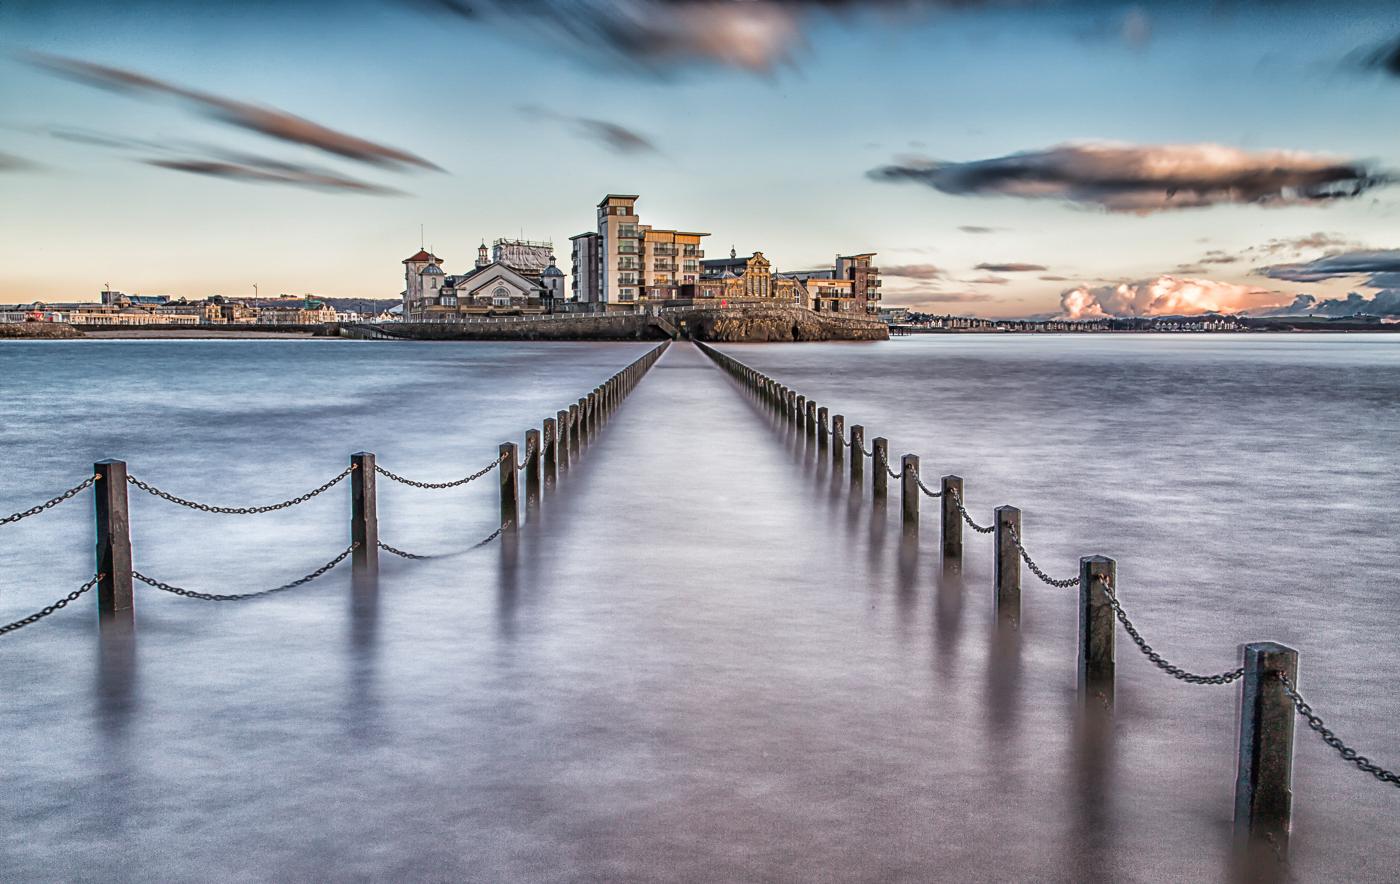 High tide at Weston super Mare